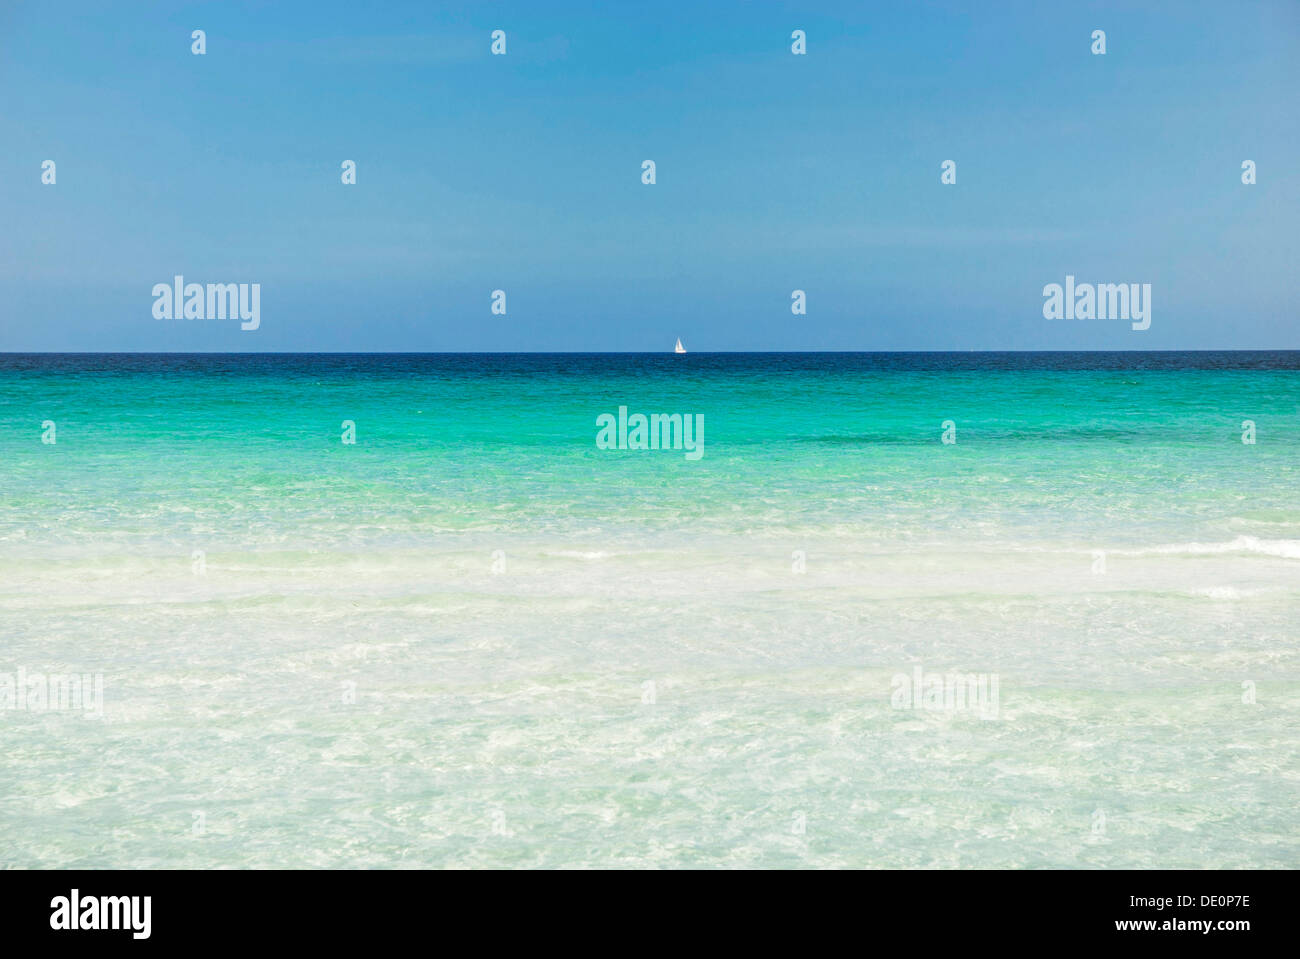 Horizon with sailing ship, turquoise sea with sandy beach, La Cinta, Sardinia, Italy, Europe - Stock Image